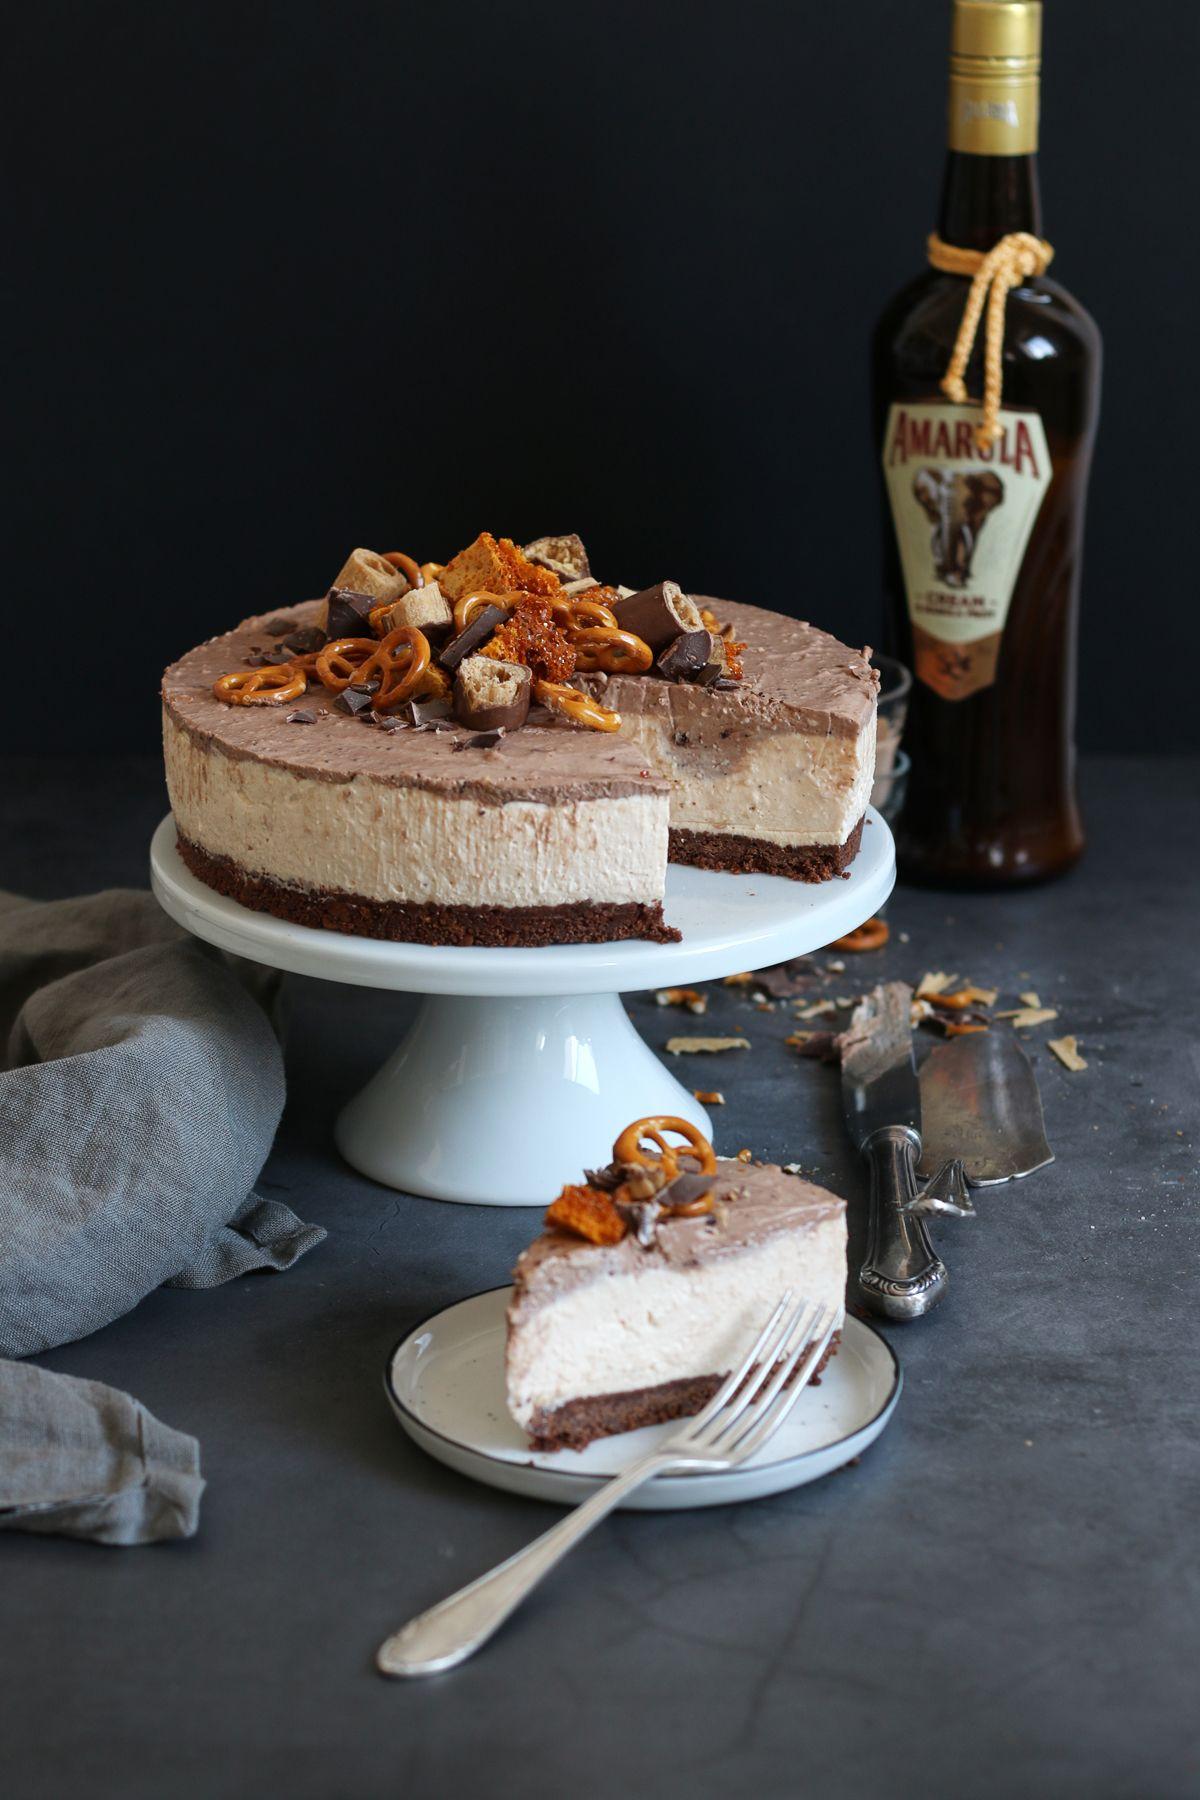 Amarula no bake Cheesecake..